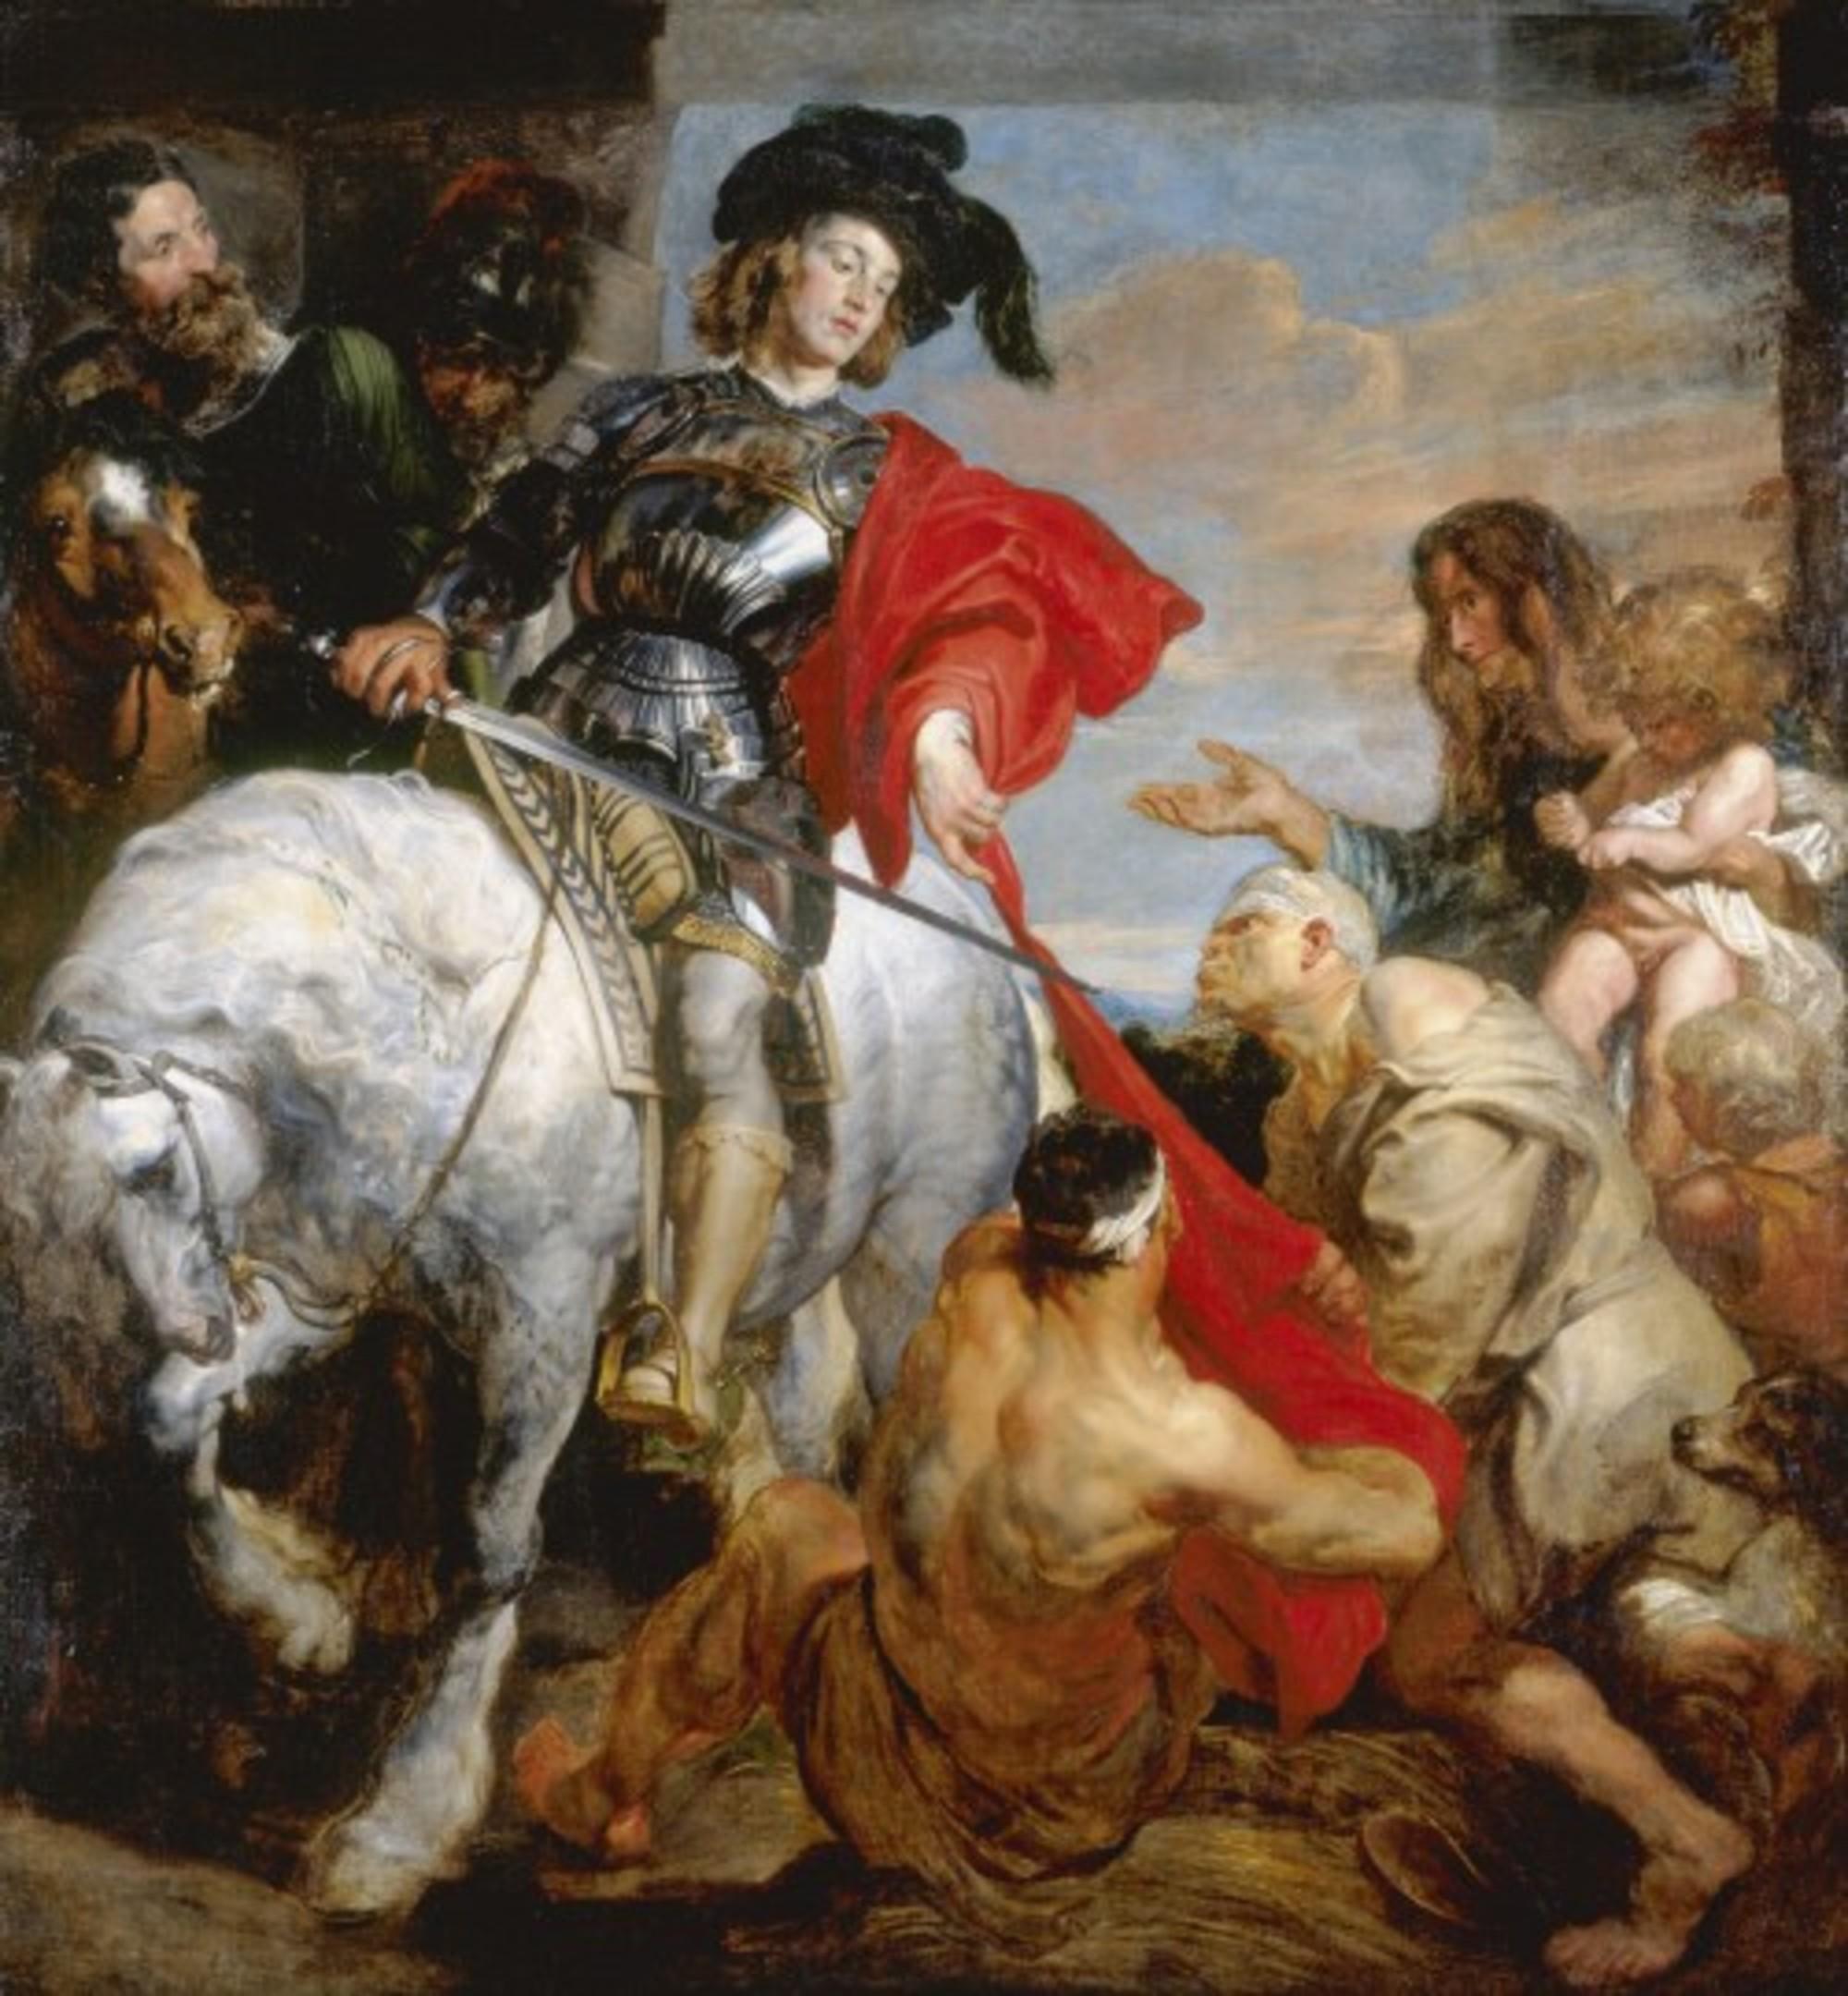 Van-Dyck---St-Martin-Dividing-his-Cloak-c.1620.jpg